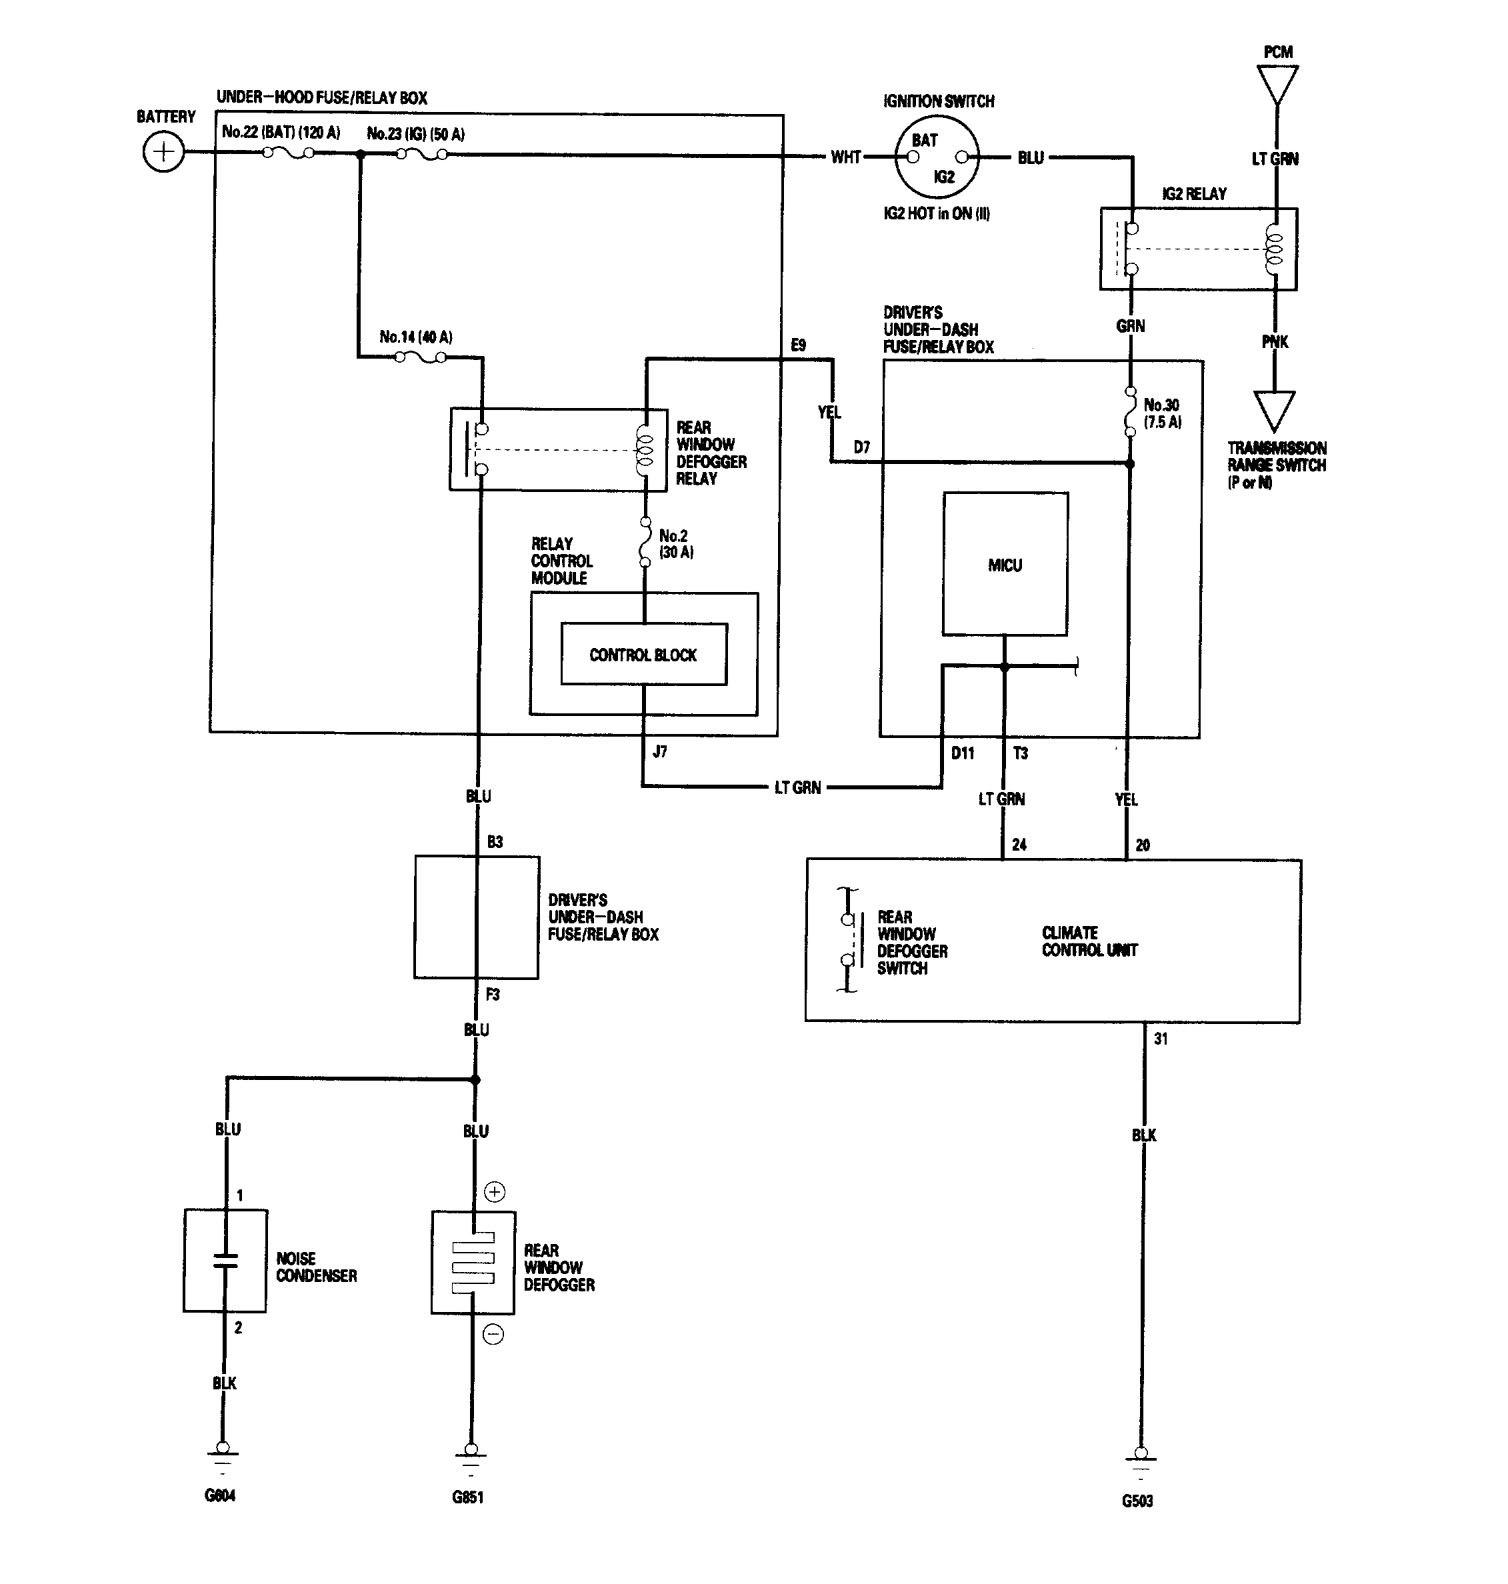 hight resolution of 2006 honda ridgeline fuel pump wiring also 2006 acura rl parts wiring diagrams honda element fuse panel